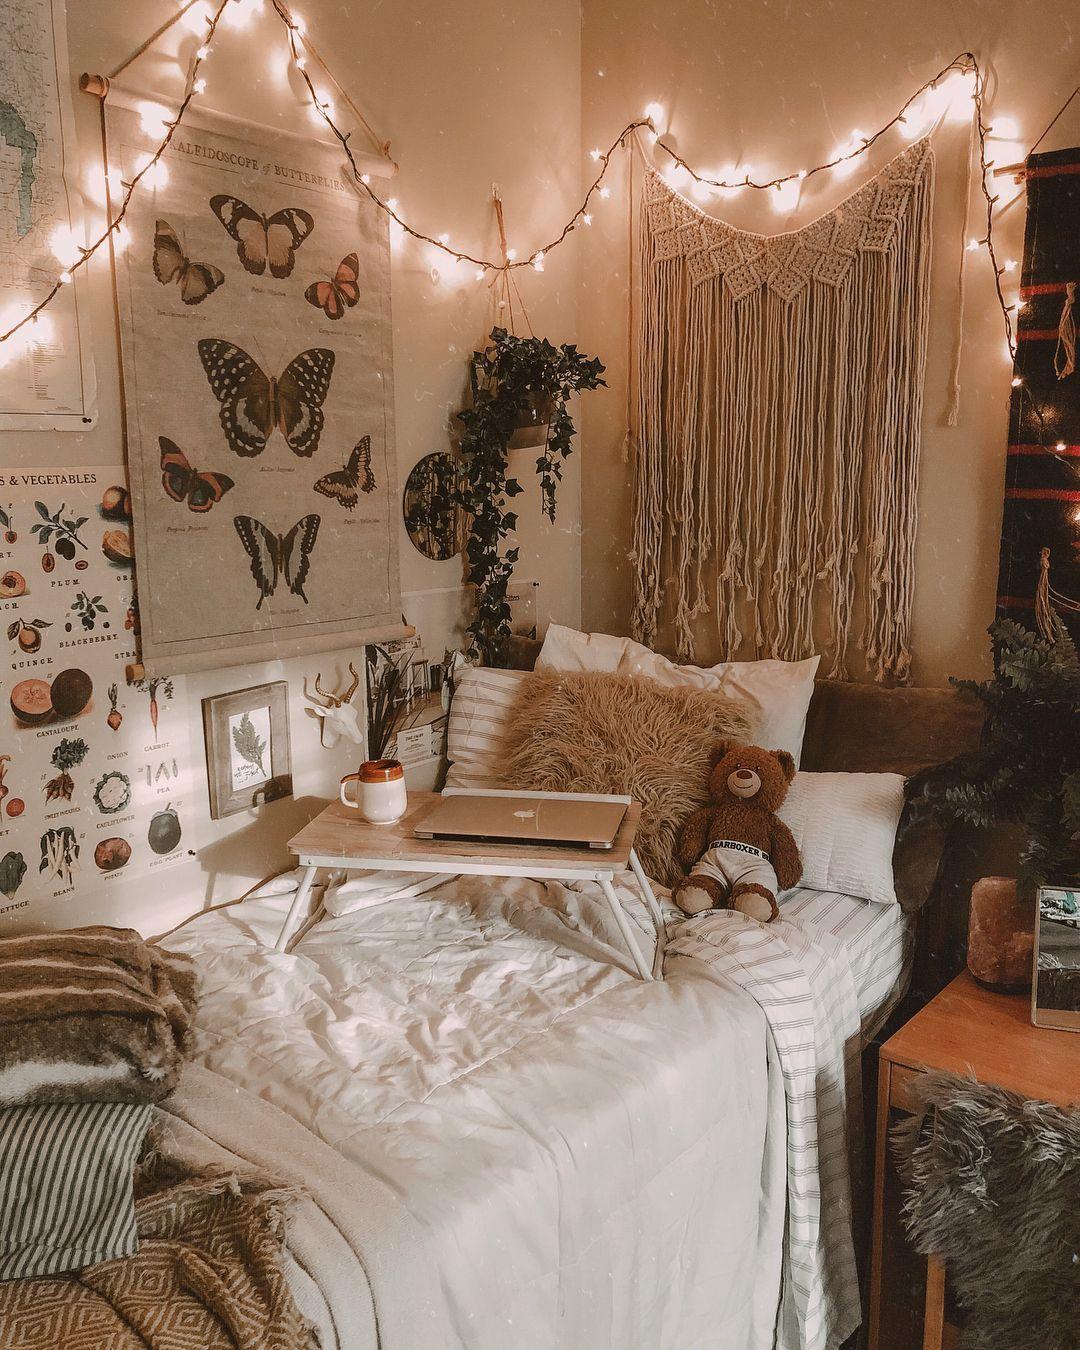 College Dorm Room Decorating